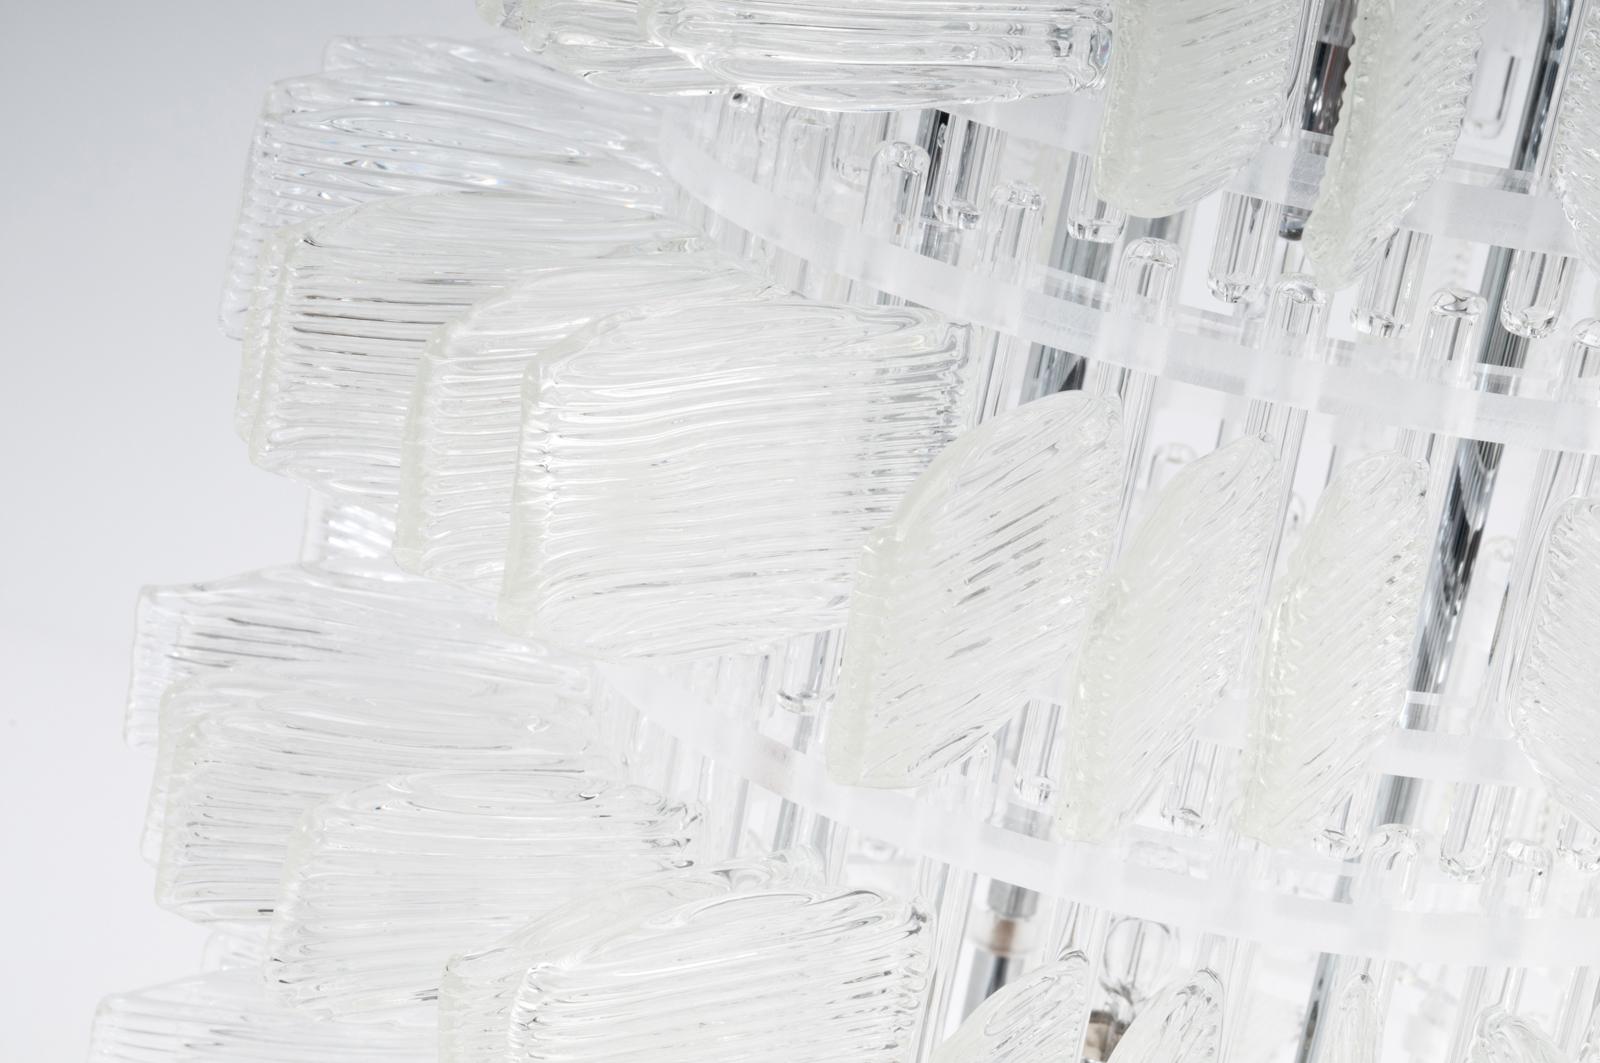 anemone-32-table-chrome-cristal-crystal-veronese-maurizio-galante-tal-lancman-111.jpg